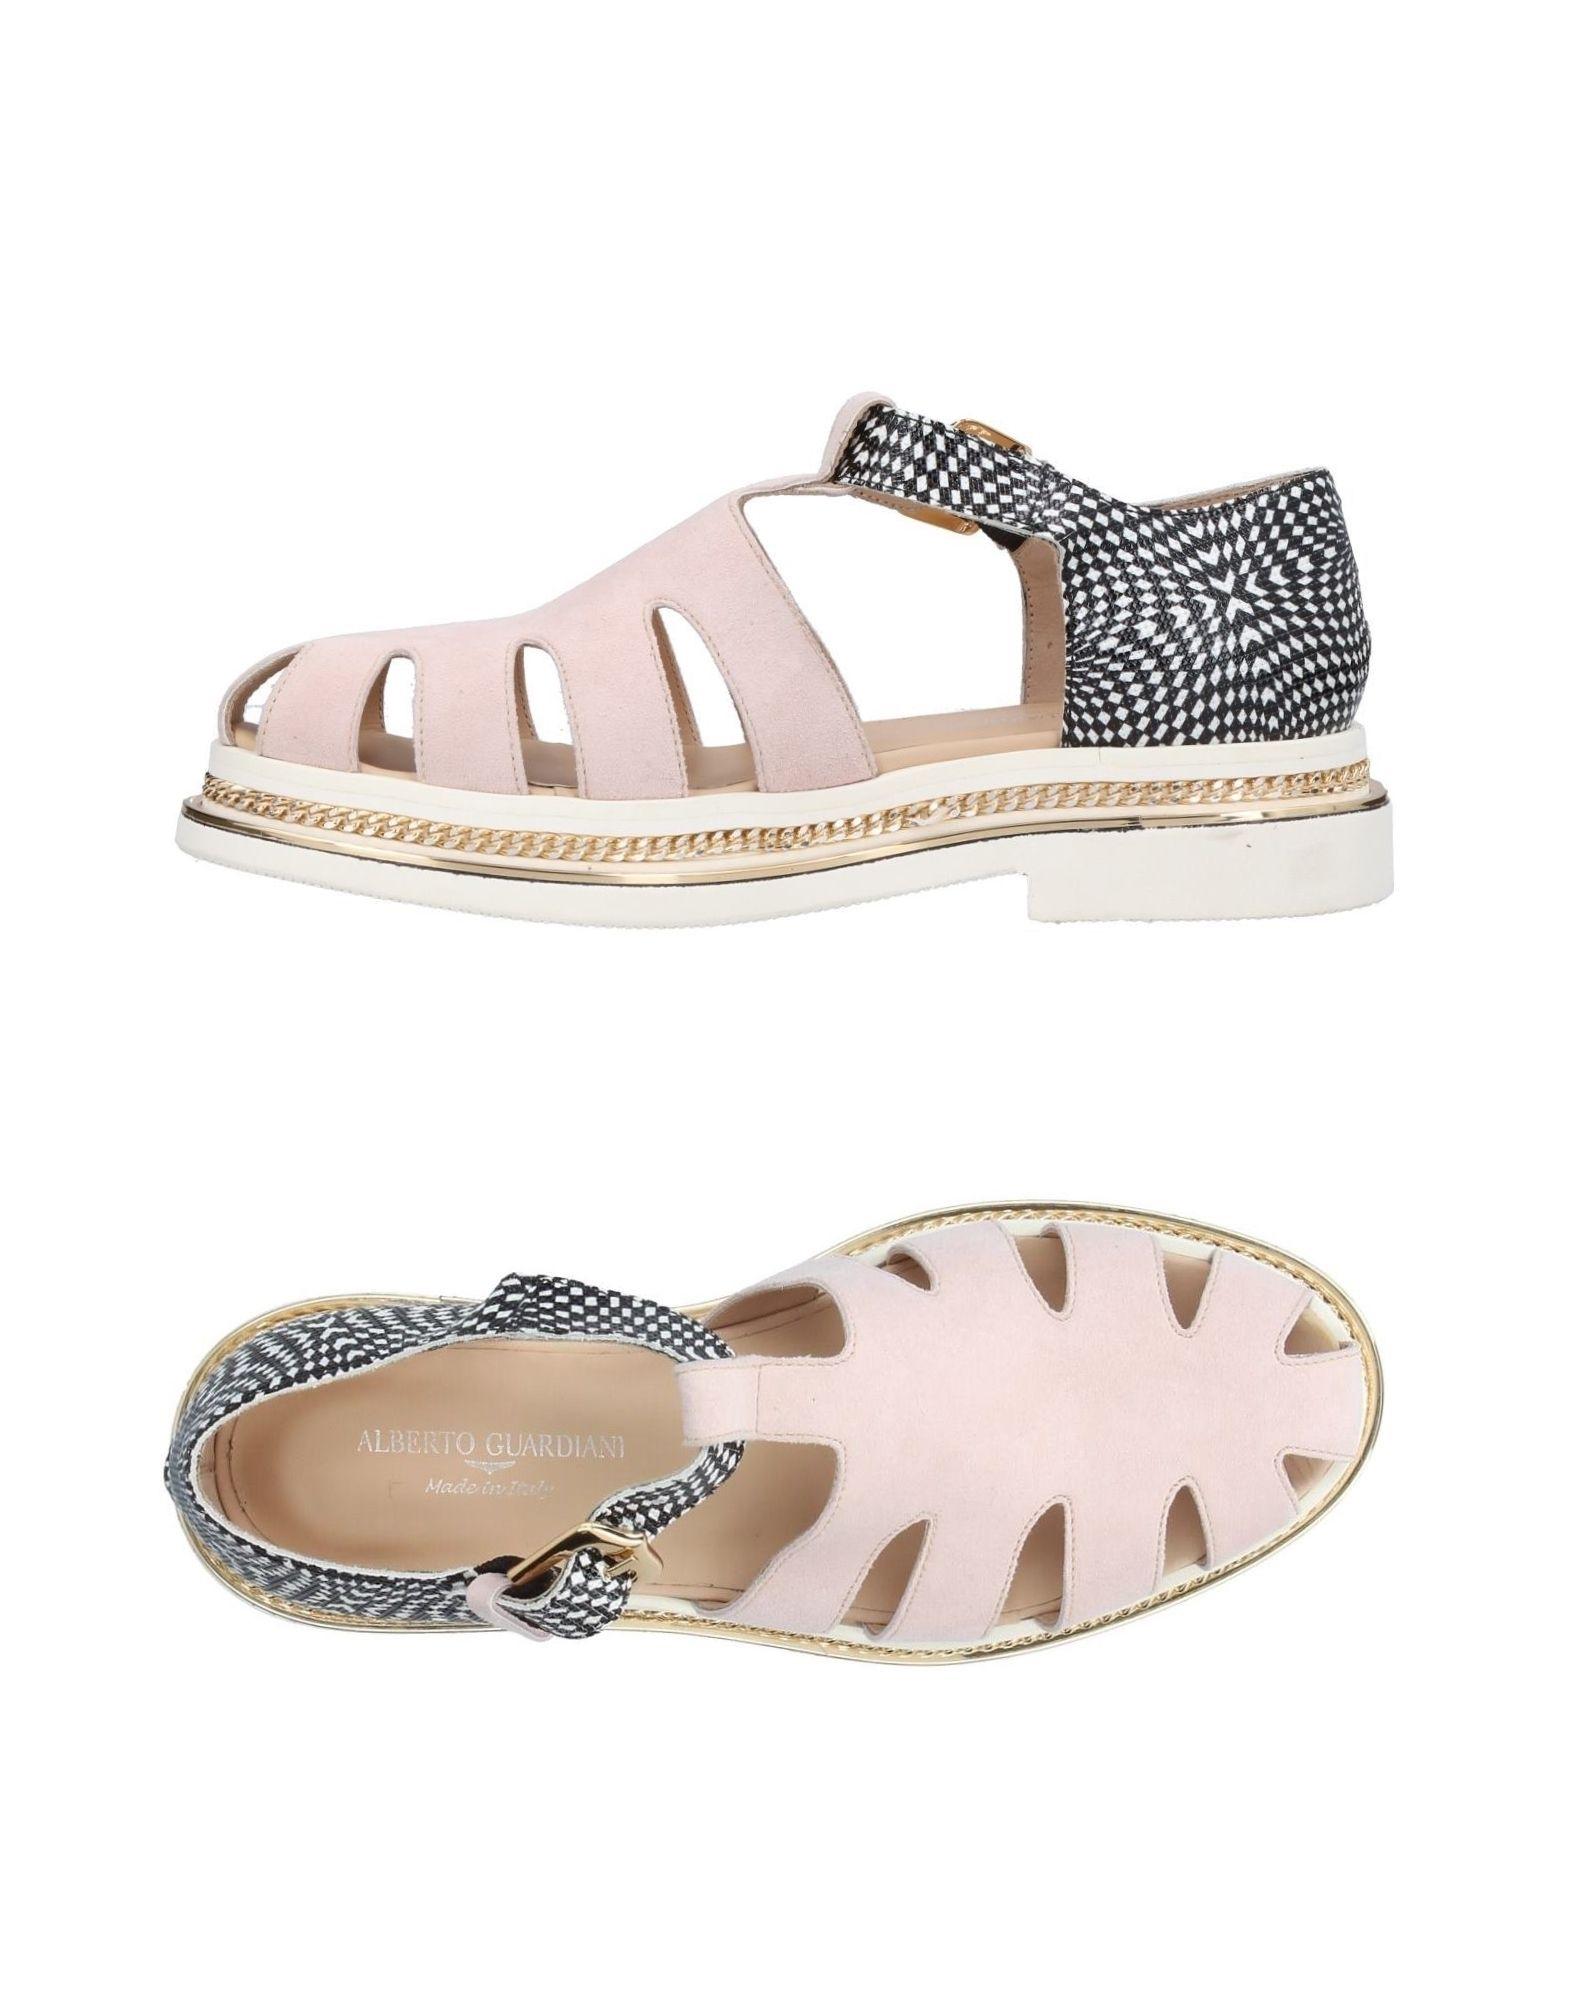 Alberto Guardiani Sandalen Damen  11399721HN Gute Qualität beliebte Schuhe